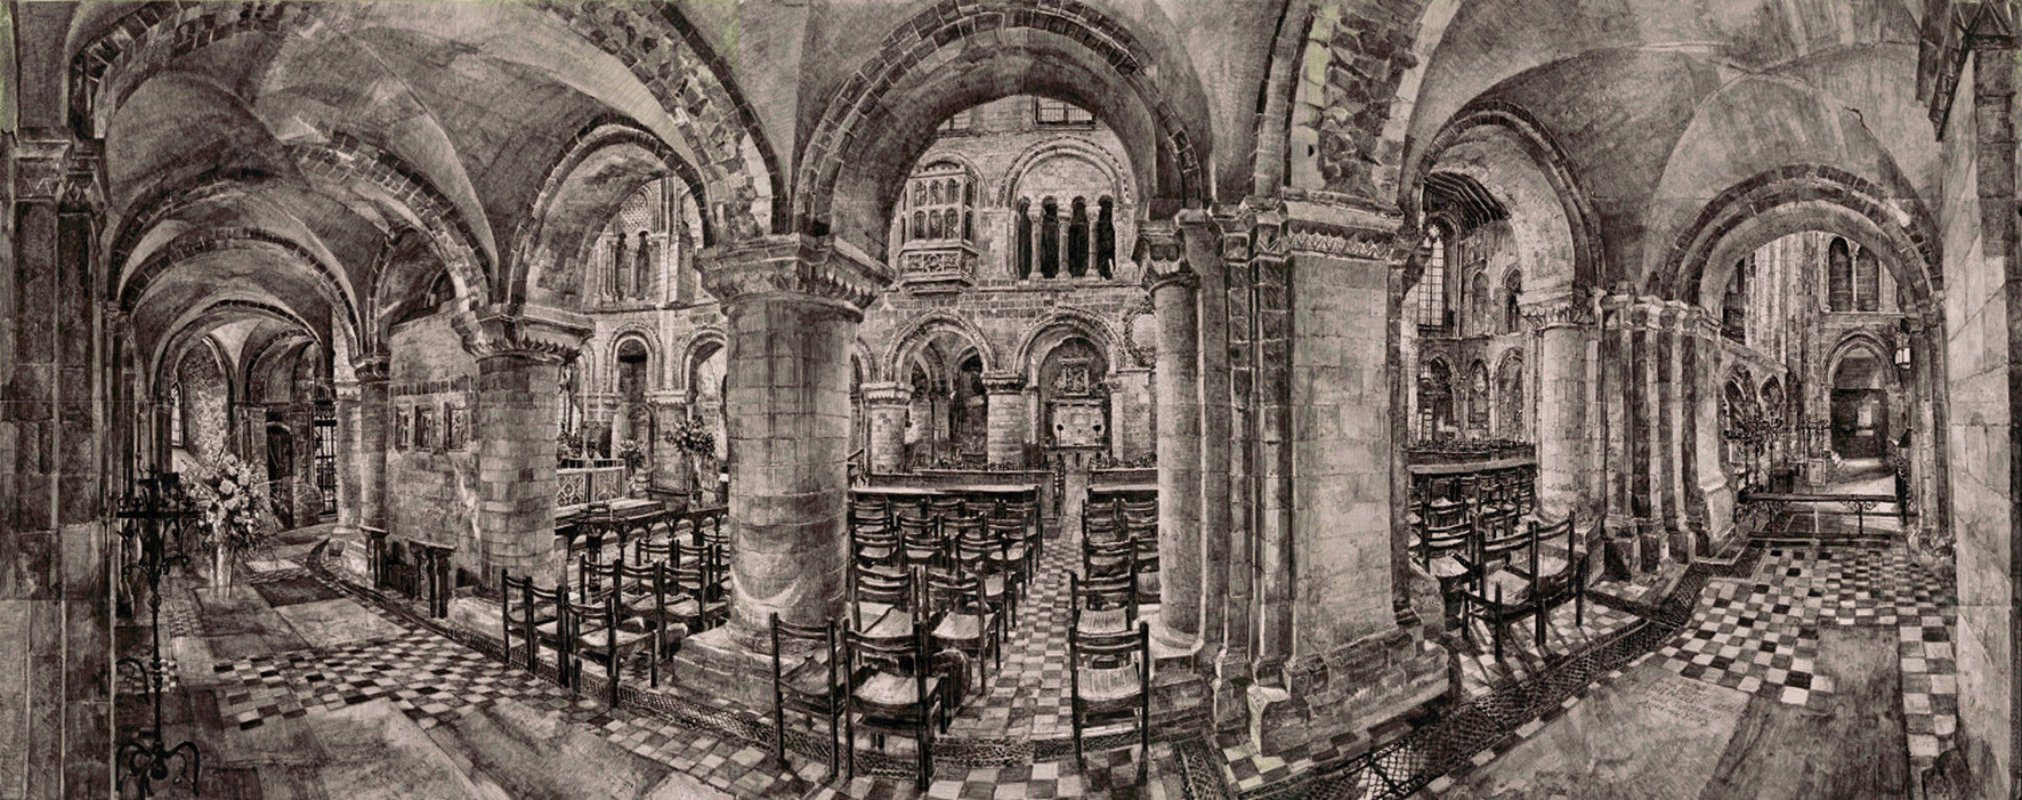 St Bartholomew-the-Great<span>Copyright Chris Green</span>